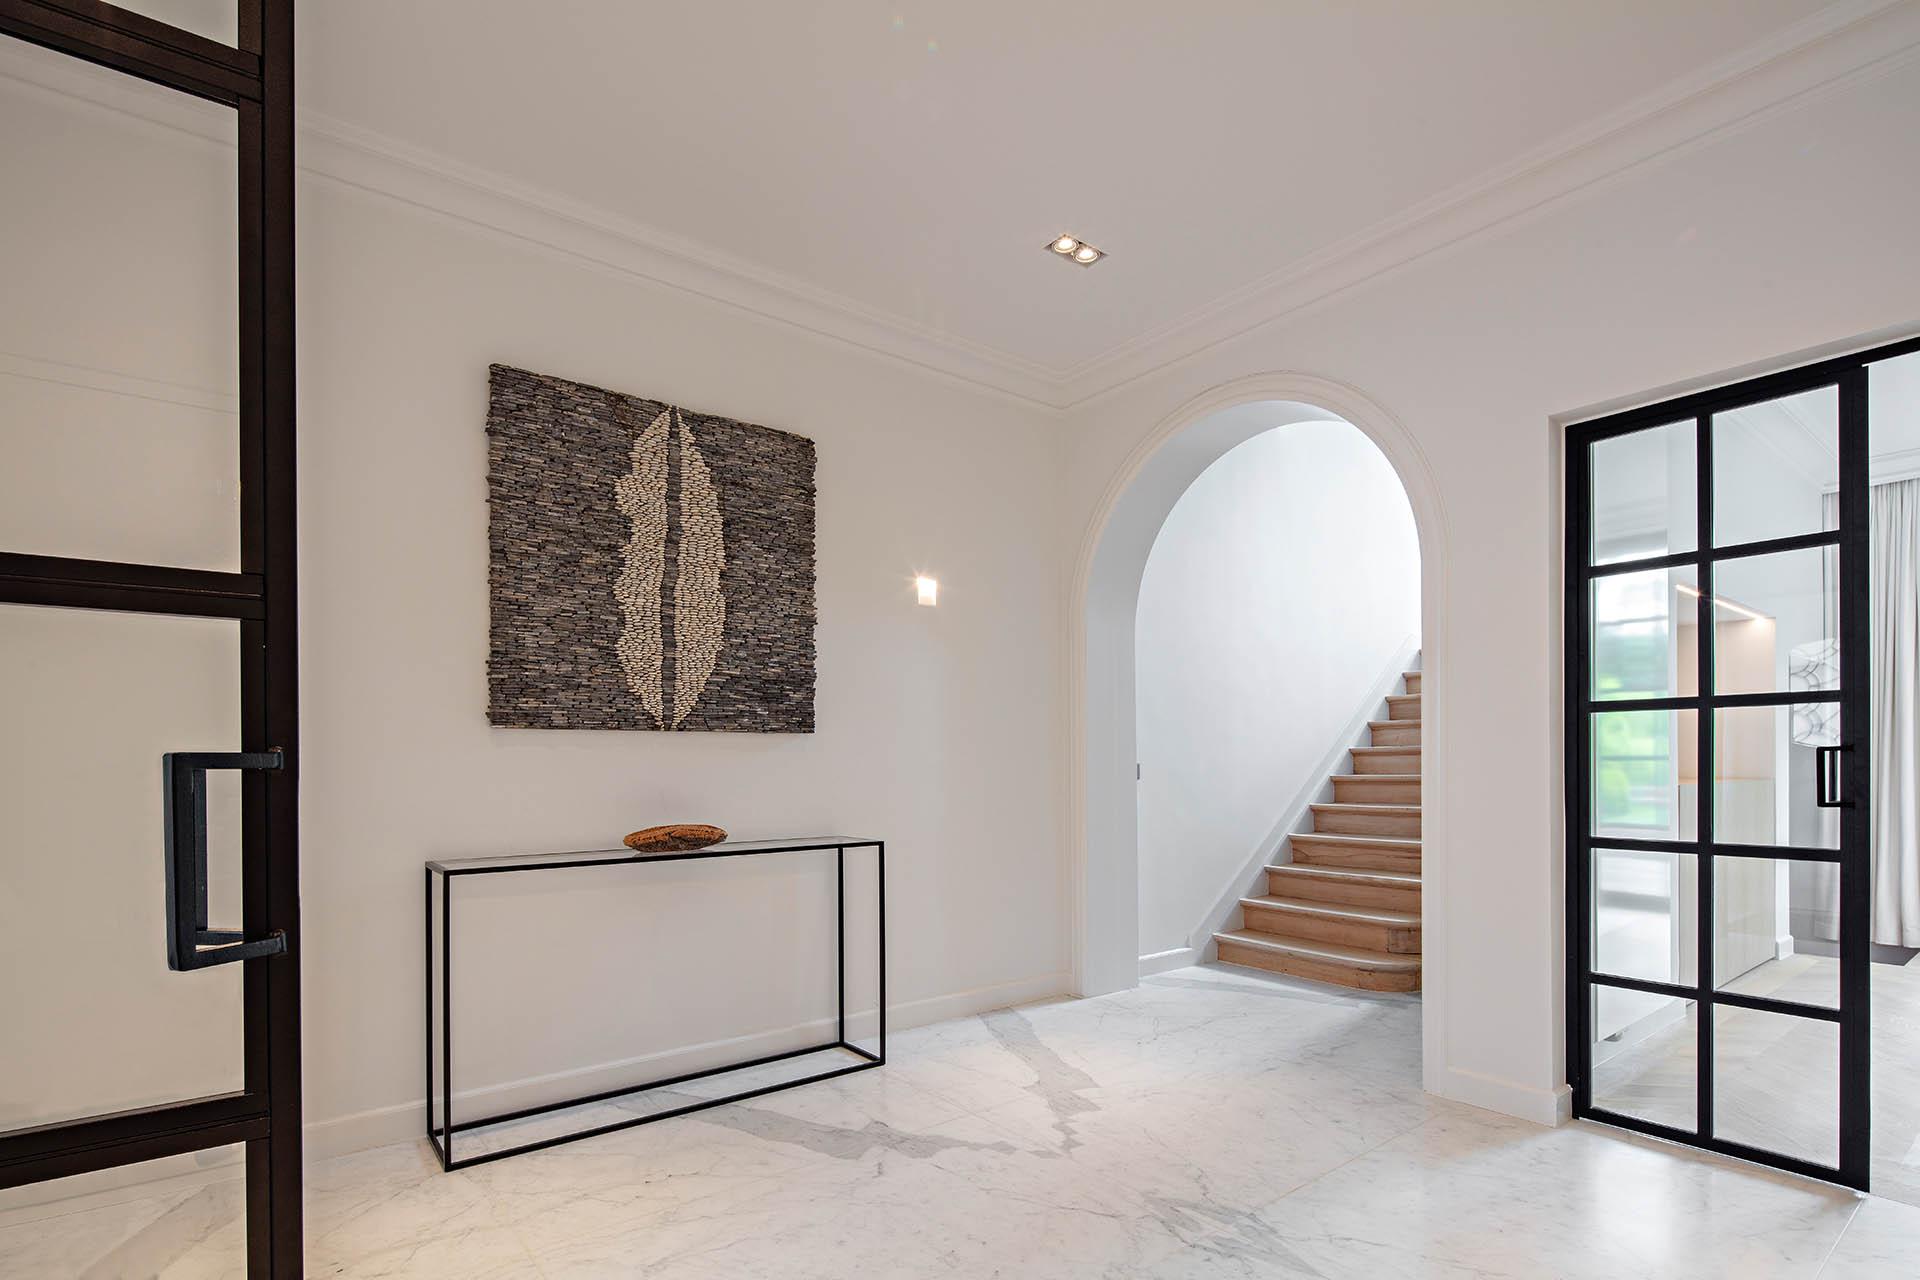 Edler Carrara Statuario Marmor Bodenbelag in XXL Fliesen in moderner Innenarchitektur